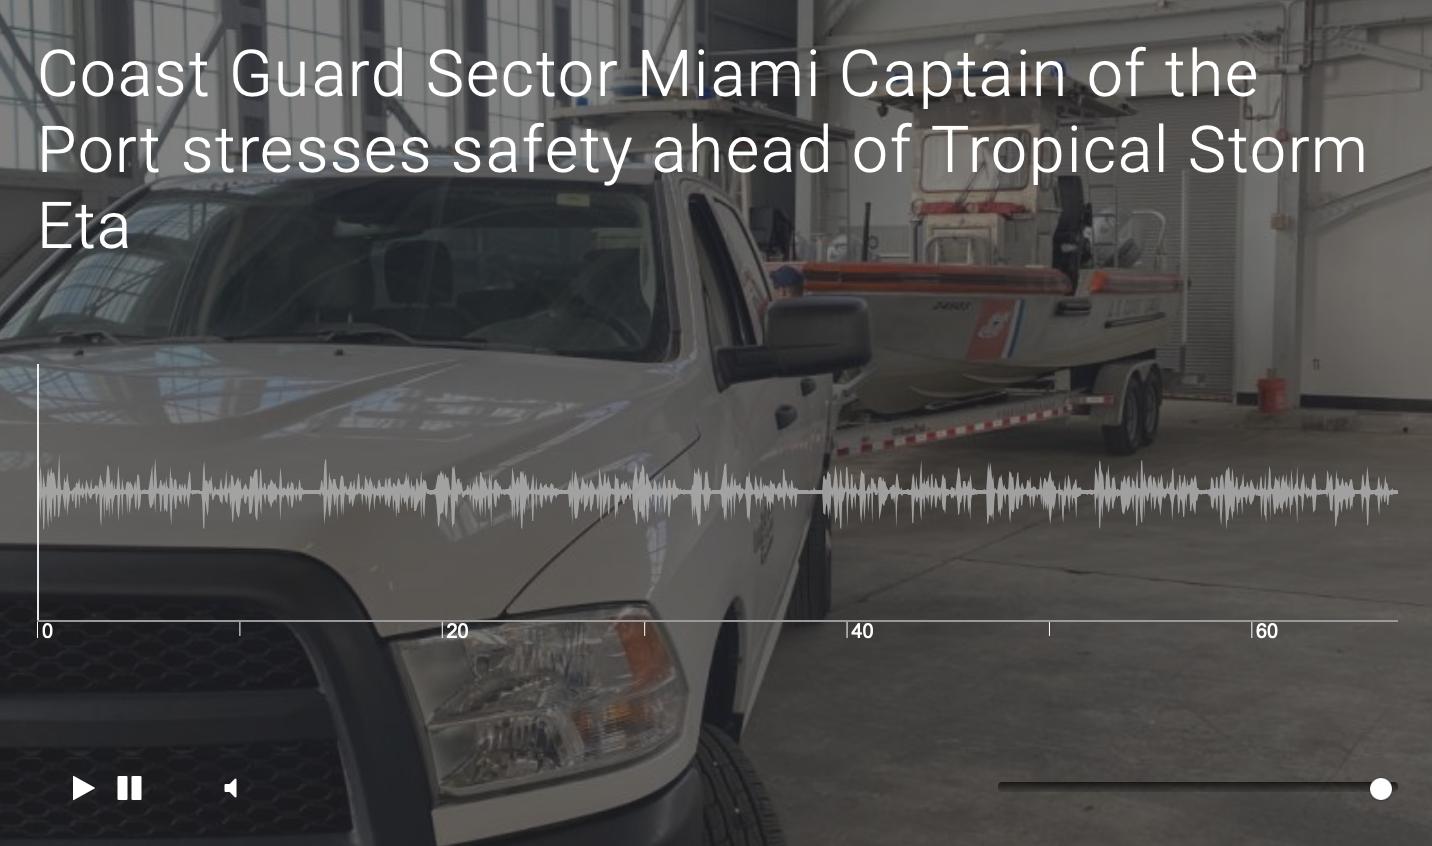 Coast Guard Sector Miami Captain of the Port stresses safety ahead of Tropical Storm Eta